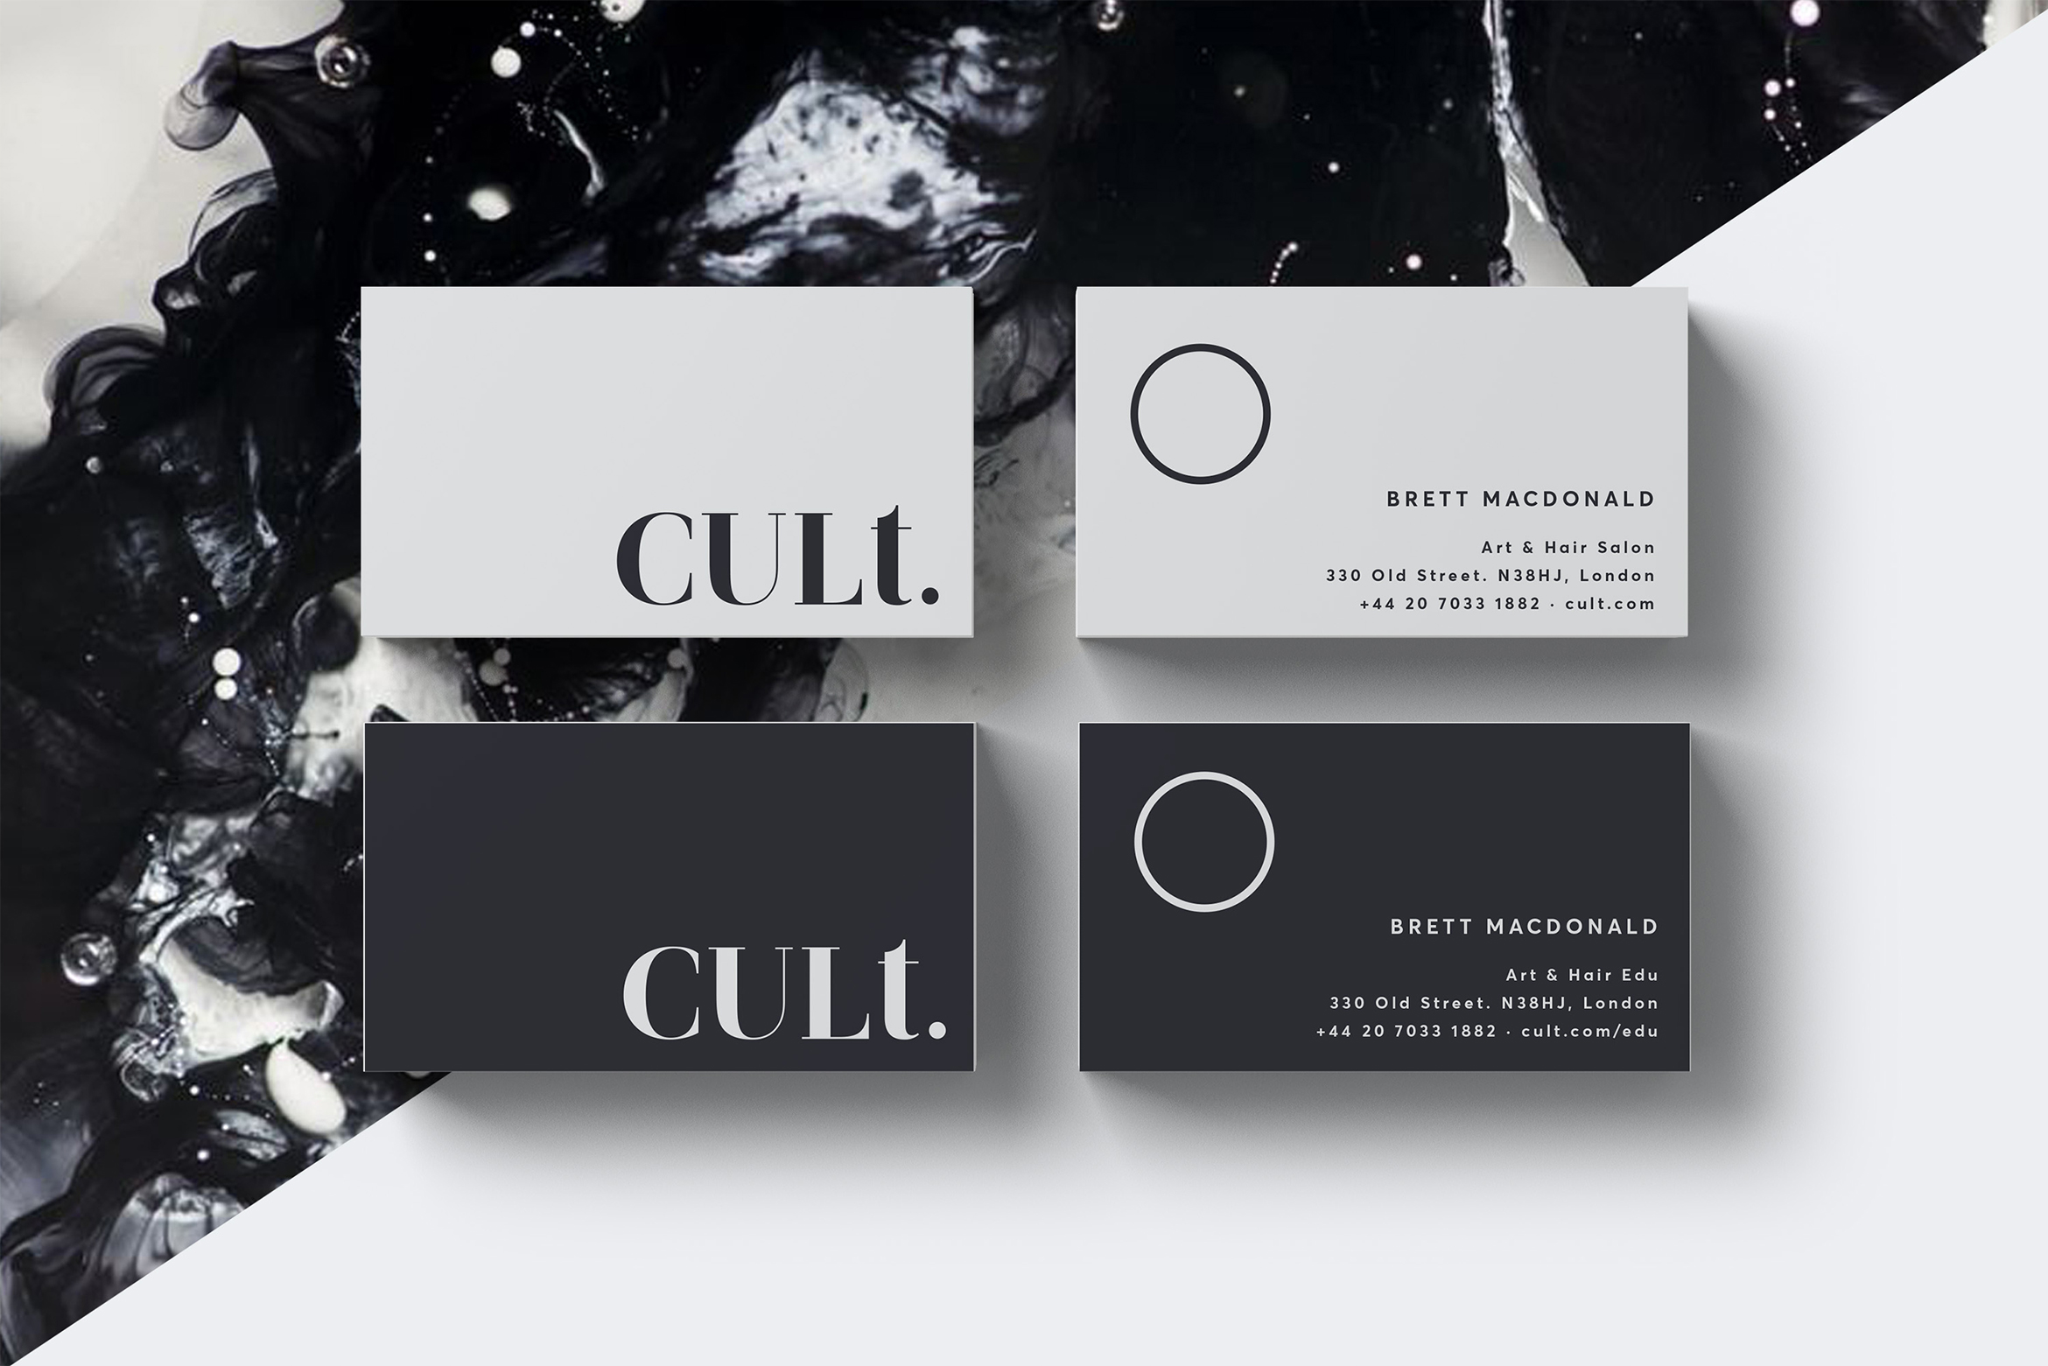 CULT_businesscard_full_grid